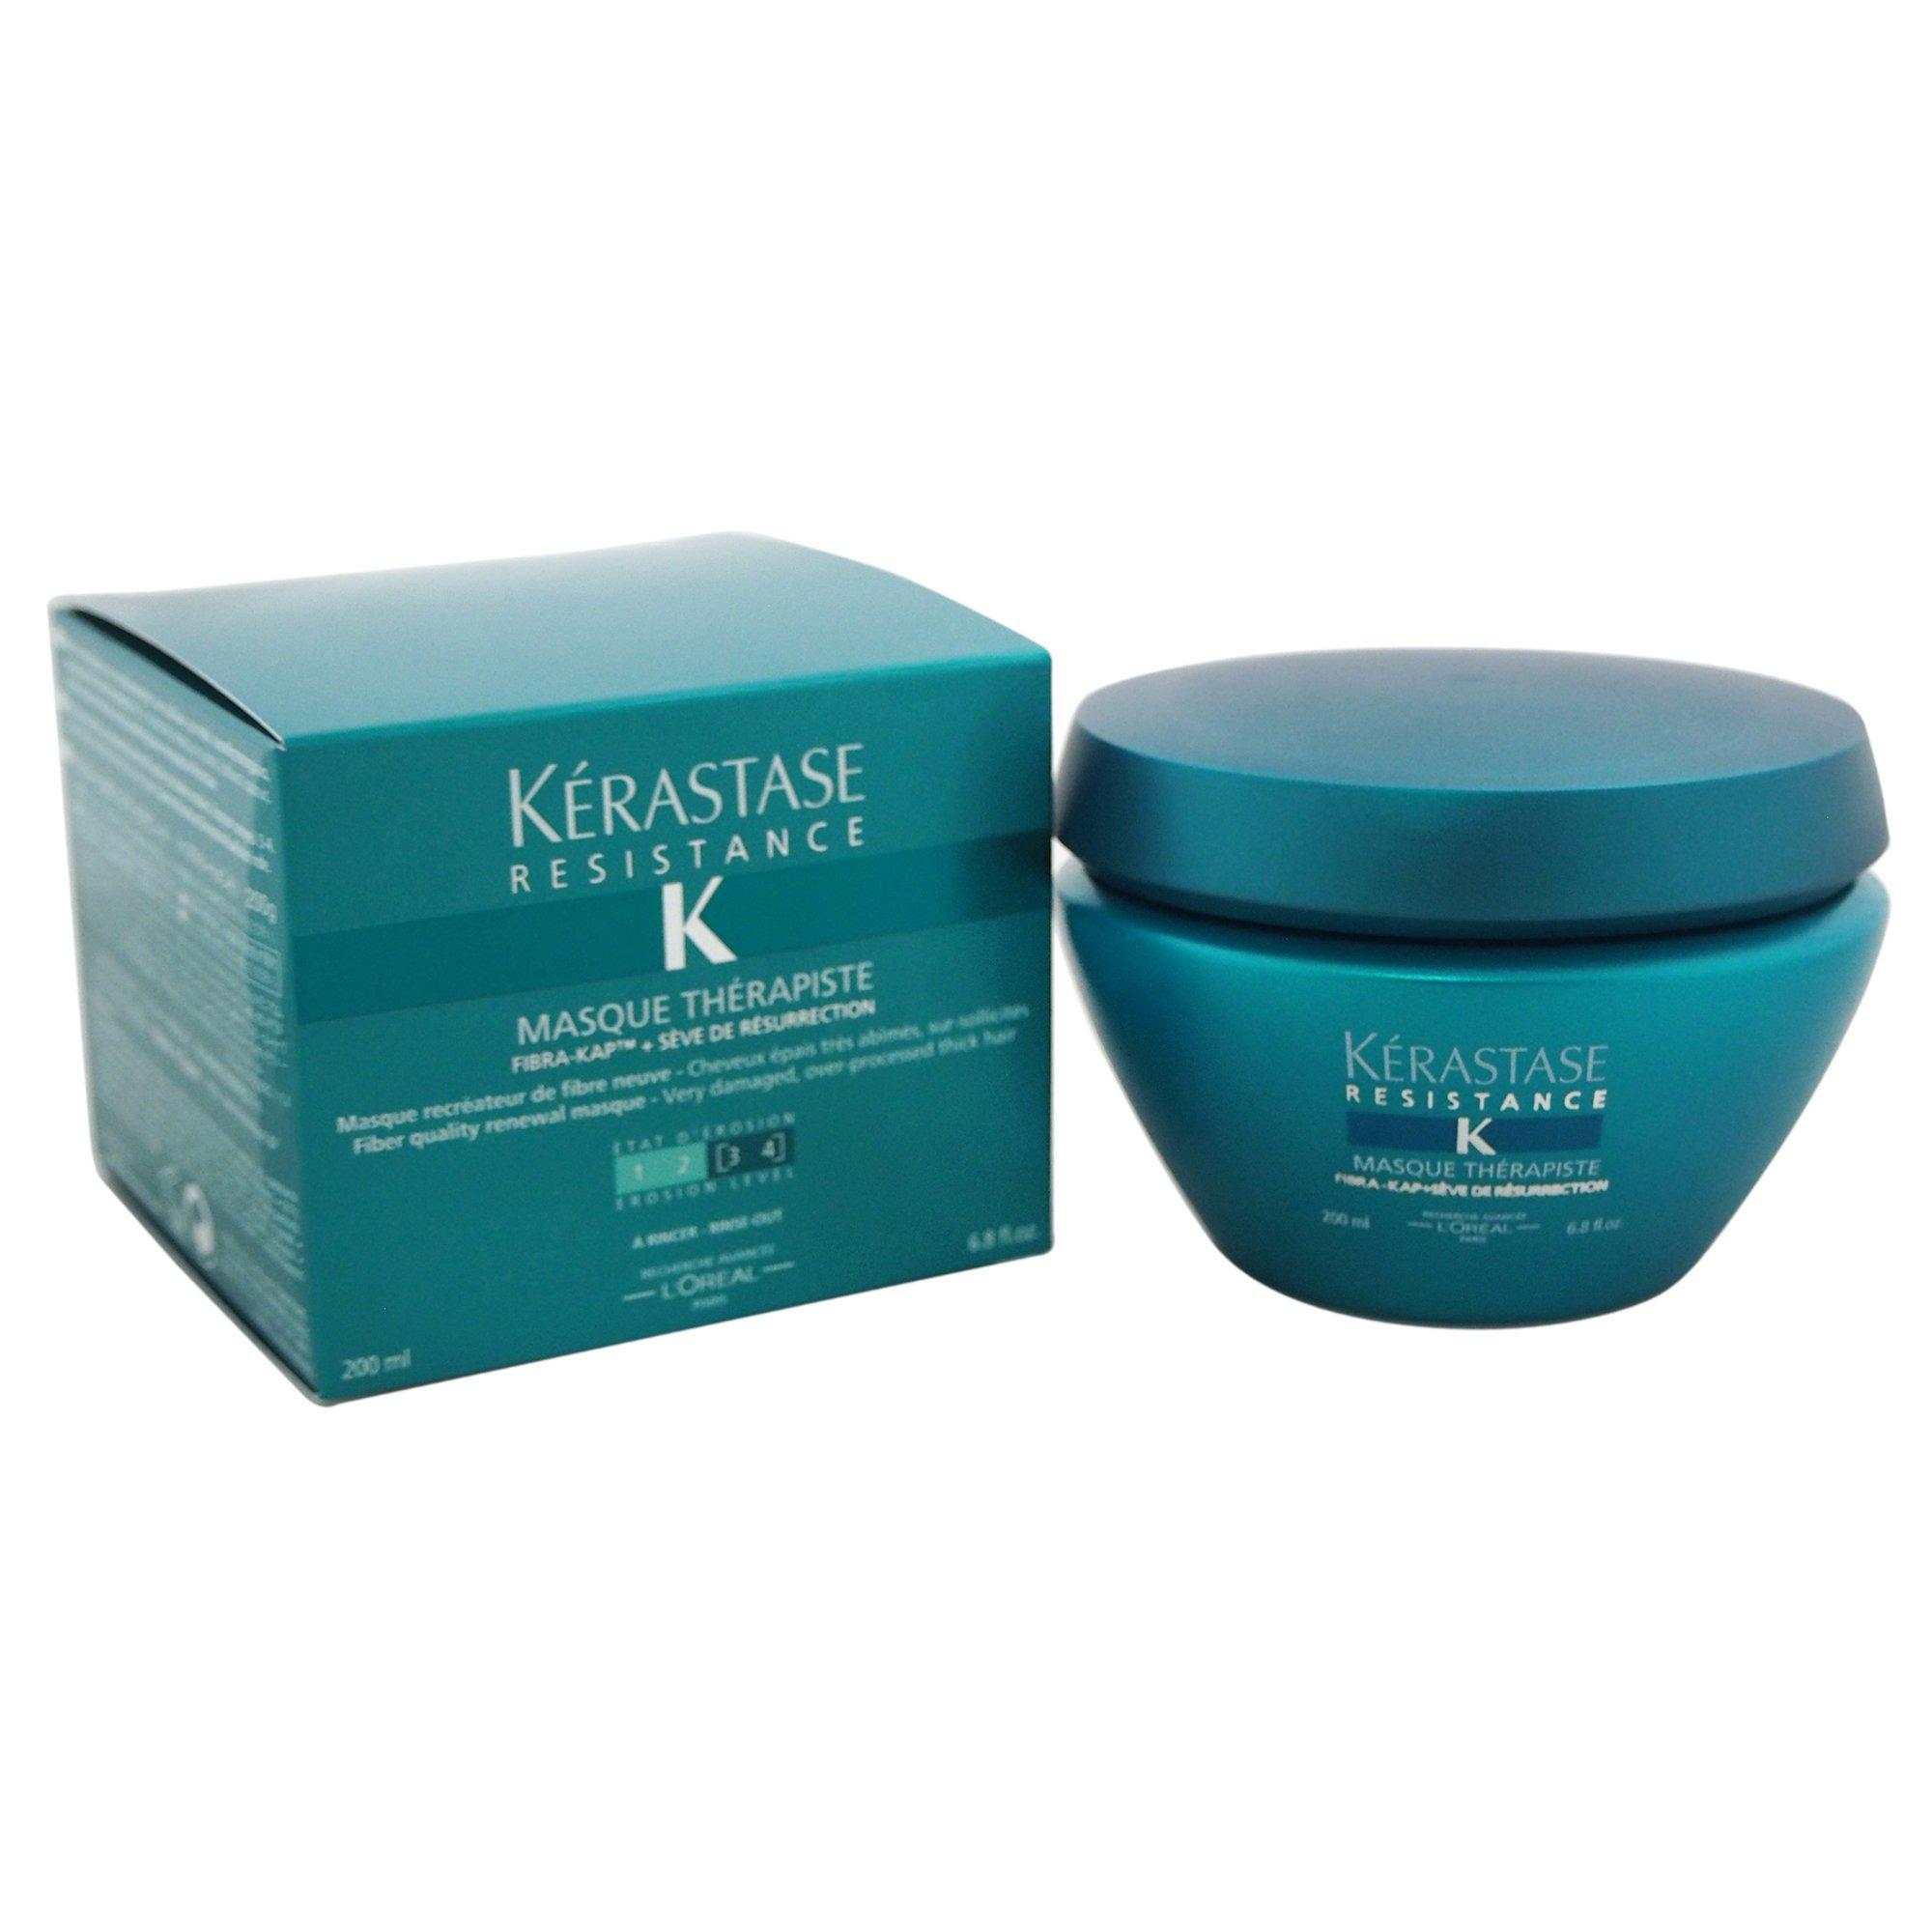 KERASTASE Resistance Therapiste Masque, multi 6.8 Fl Oz